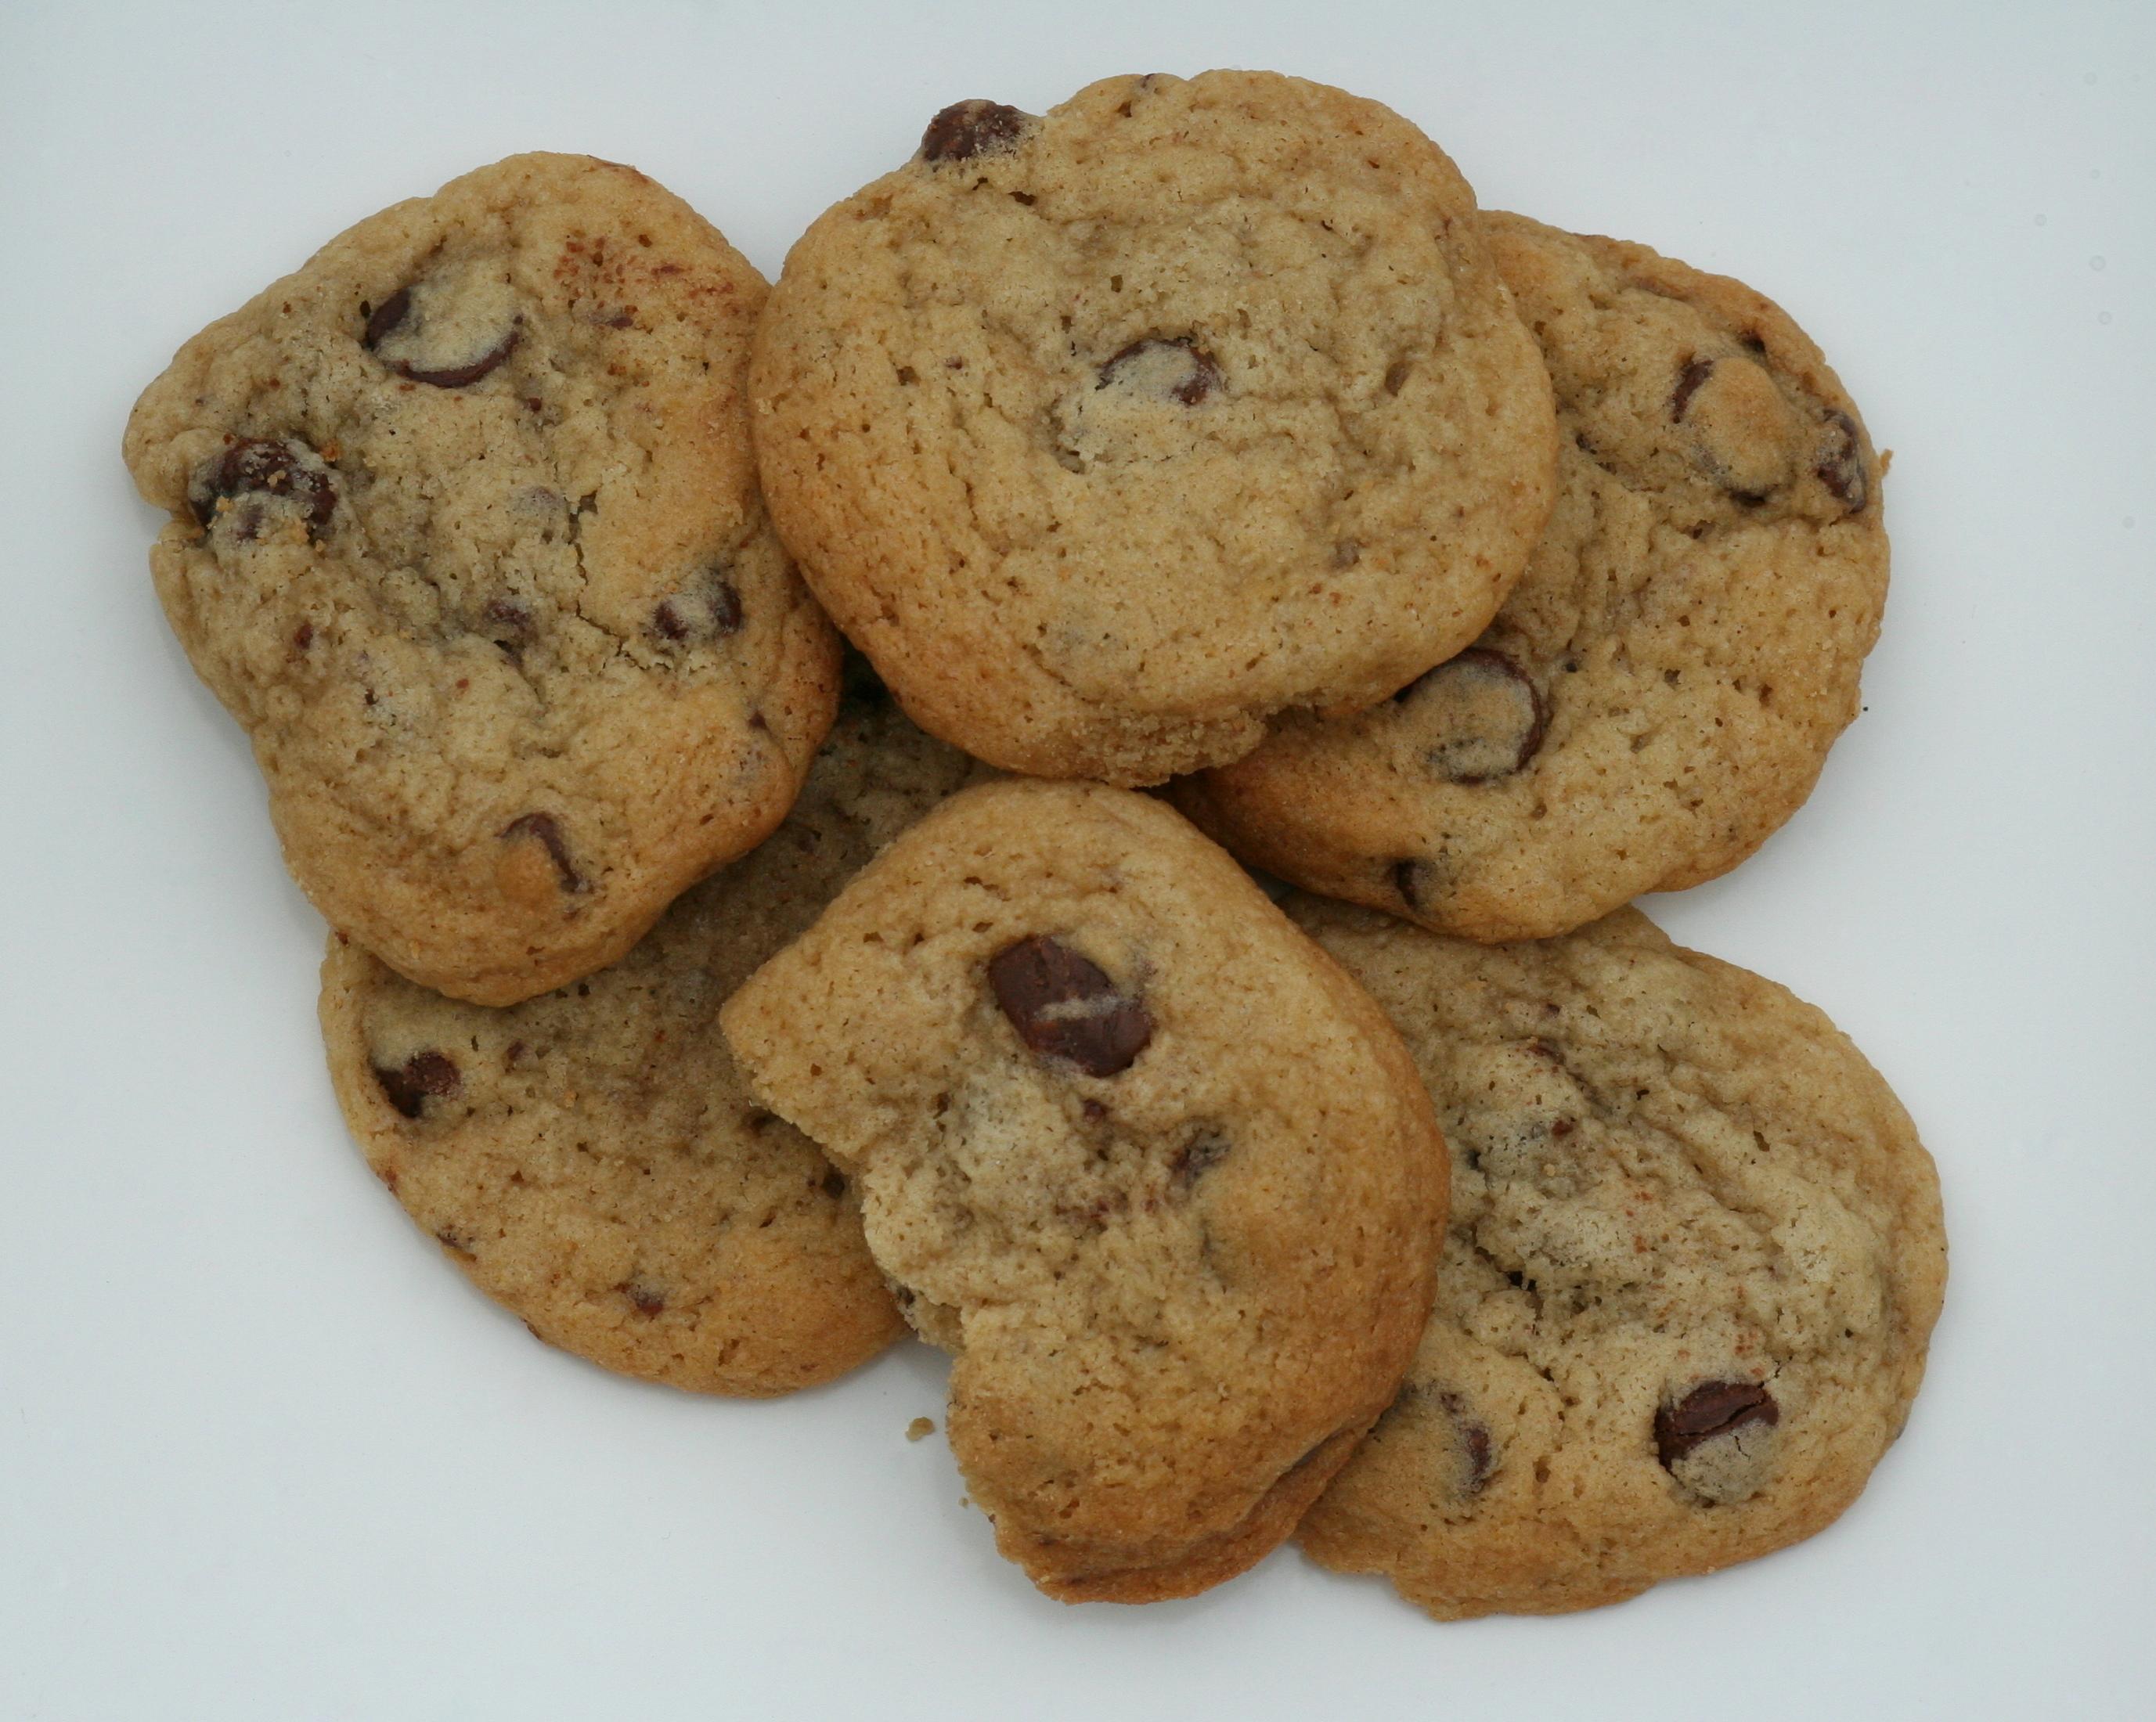 galletas con pepitas de chocolate receta casera